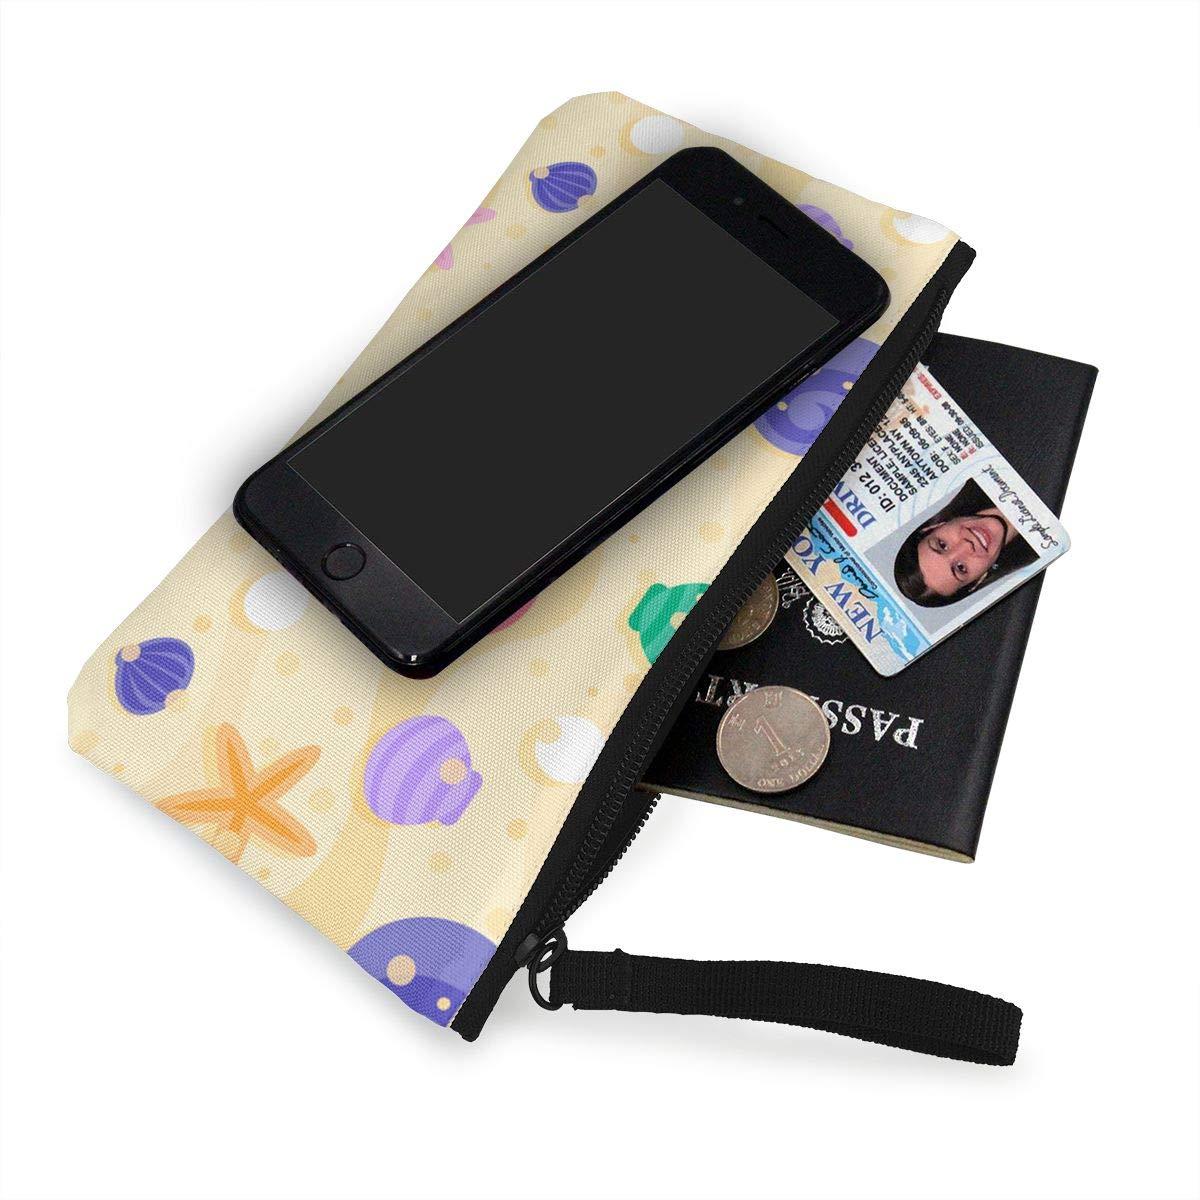 Amazon.com: Monedero de lienzo para monedas, concha de playa ...